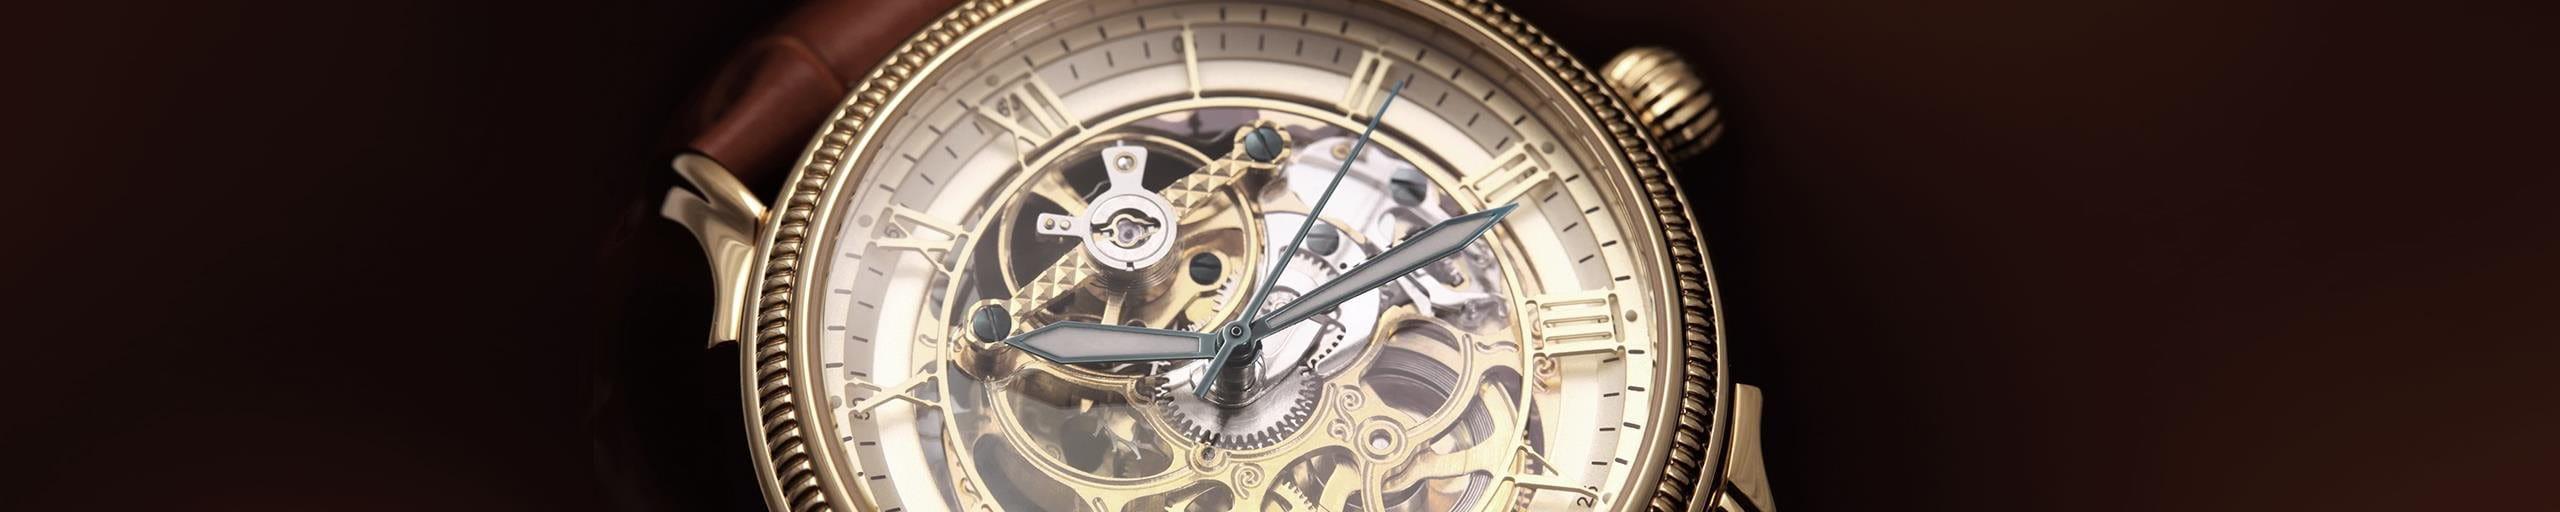 Une montre au cadran transparent.